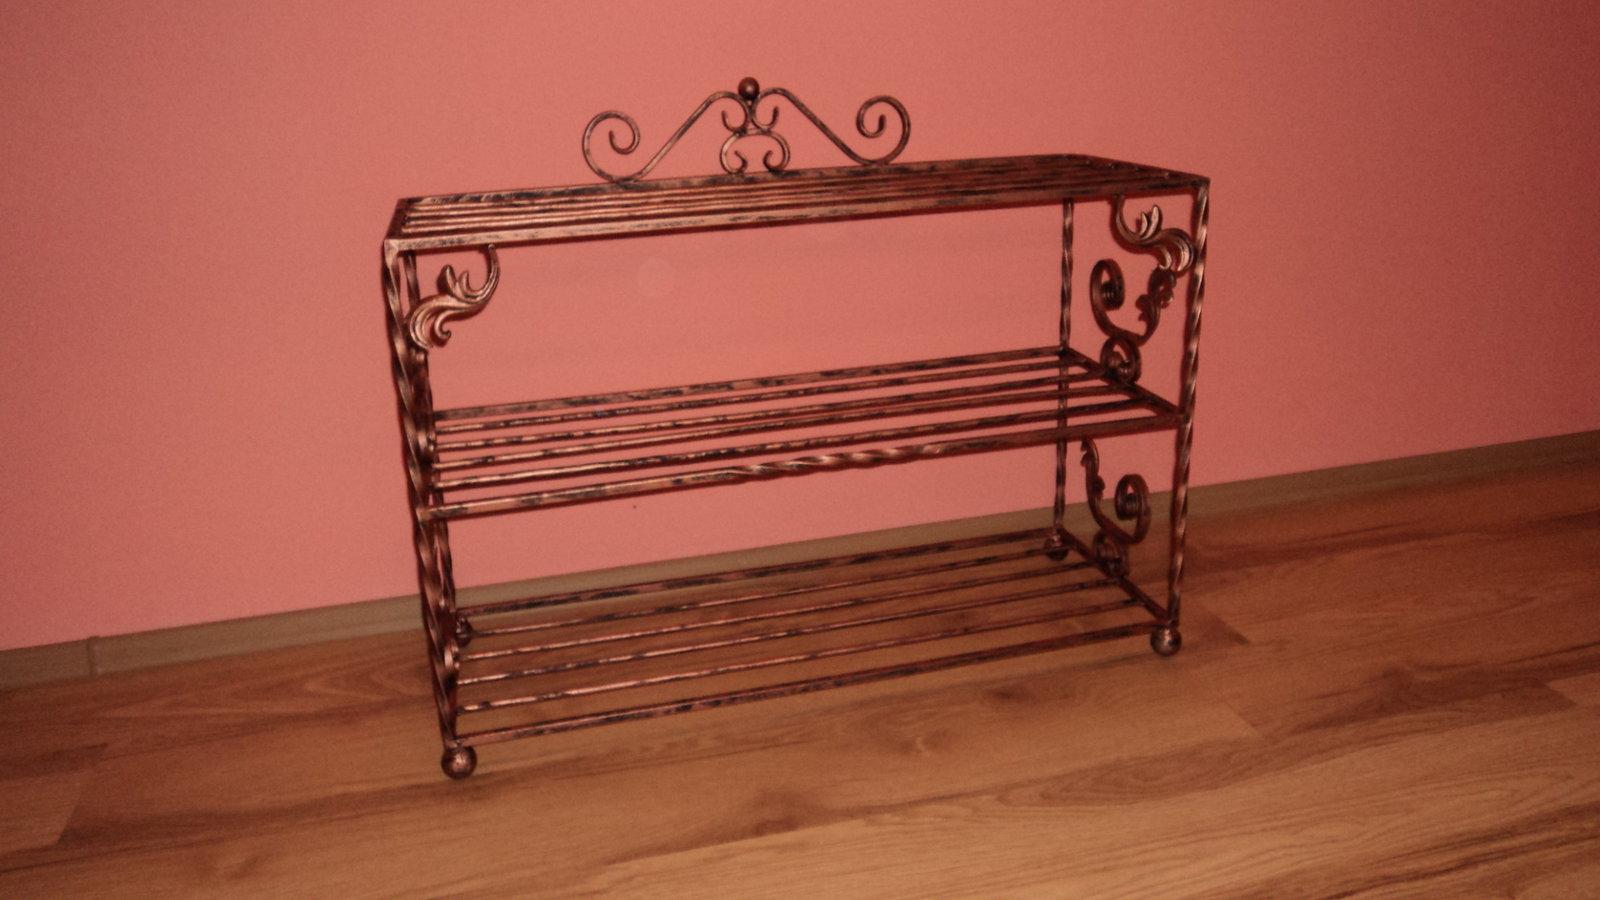 schuhregal schuhbank schuhschrank schuhst nder edel antik. Black Bedroom Furniture Sets. Home Design Ideas